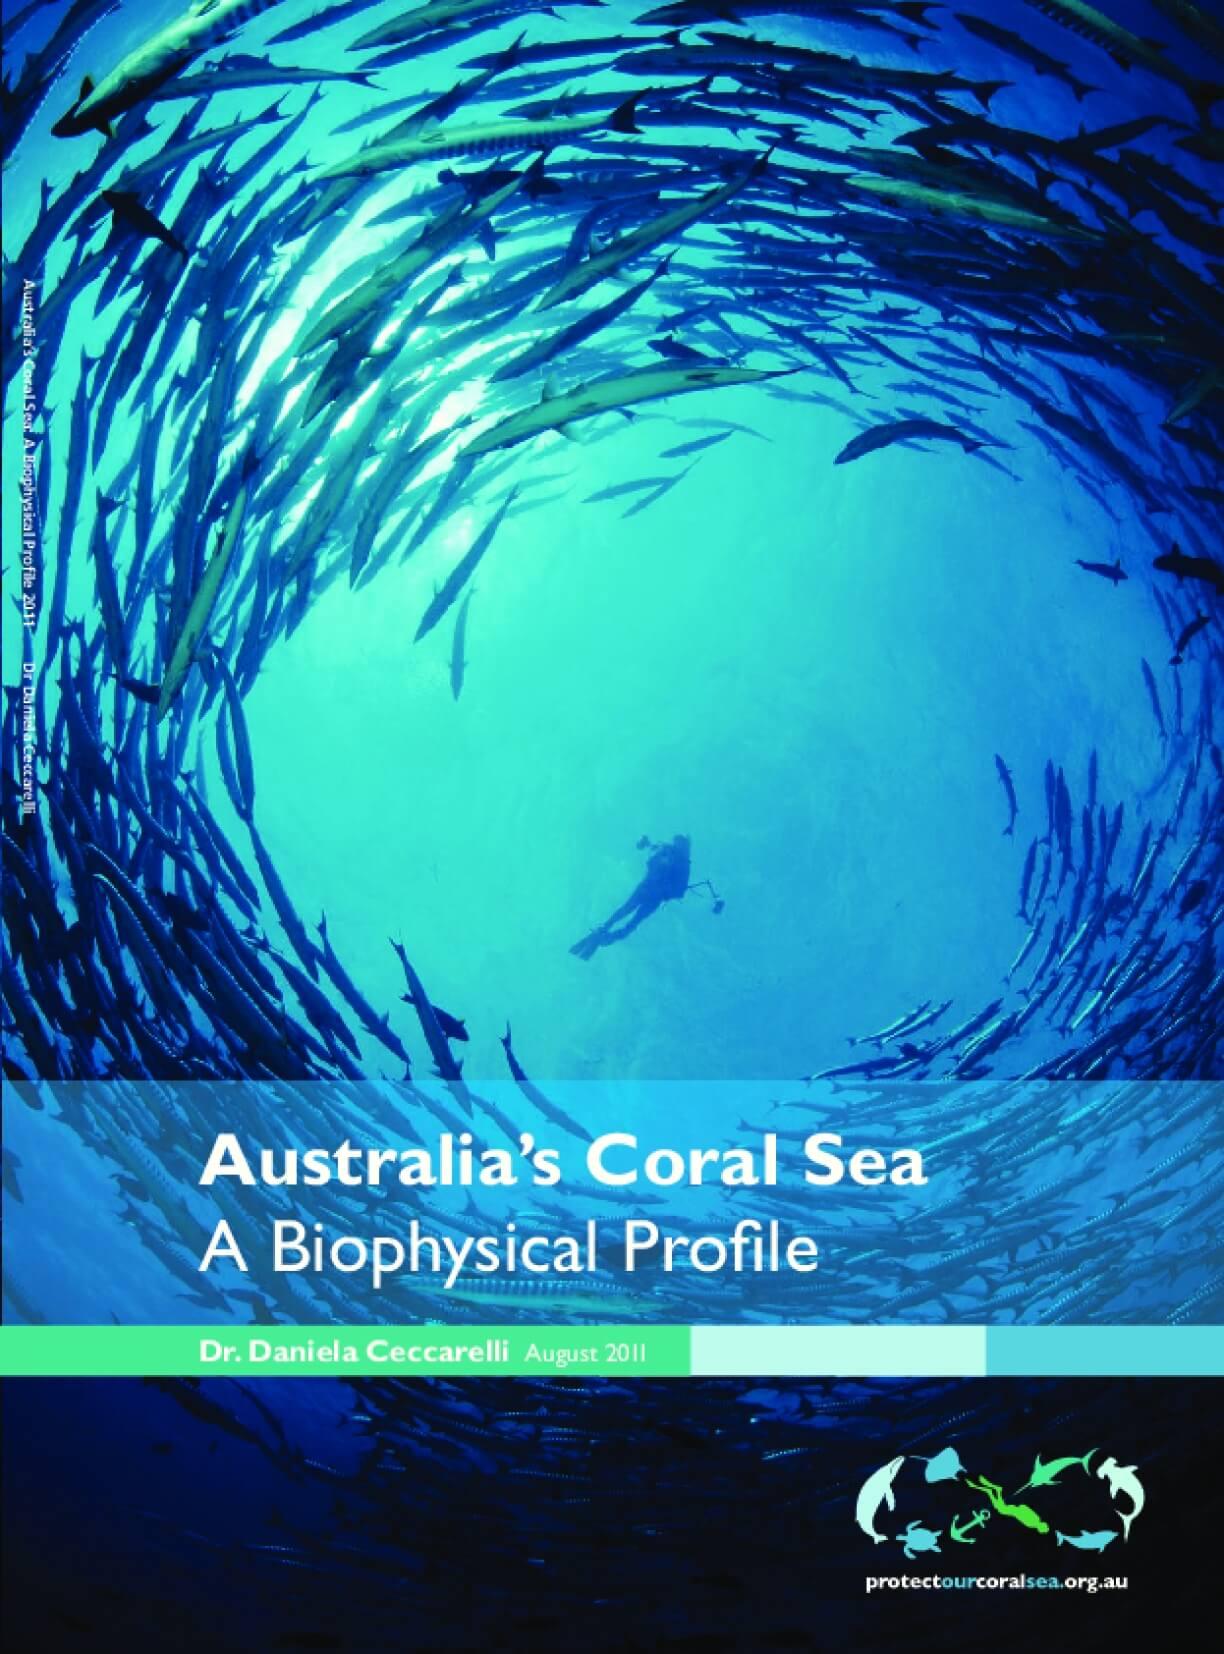 Making the Case to Protect Australia's Coral Sea